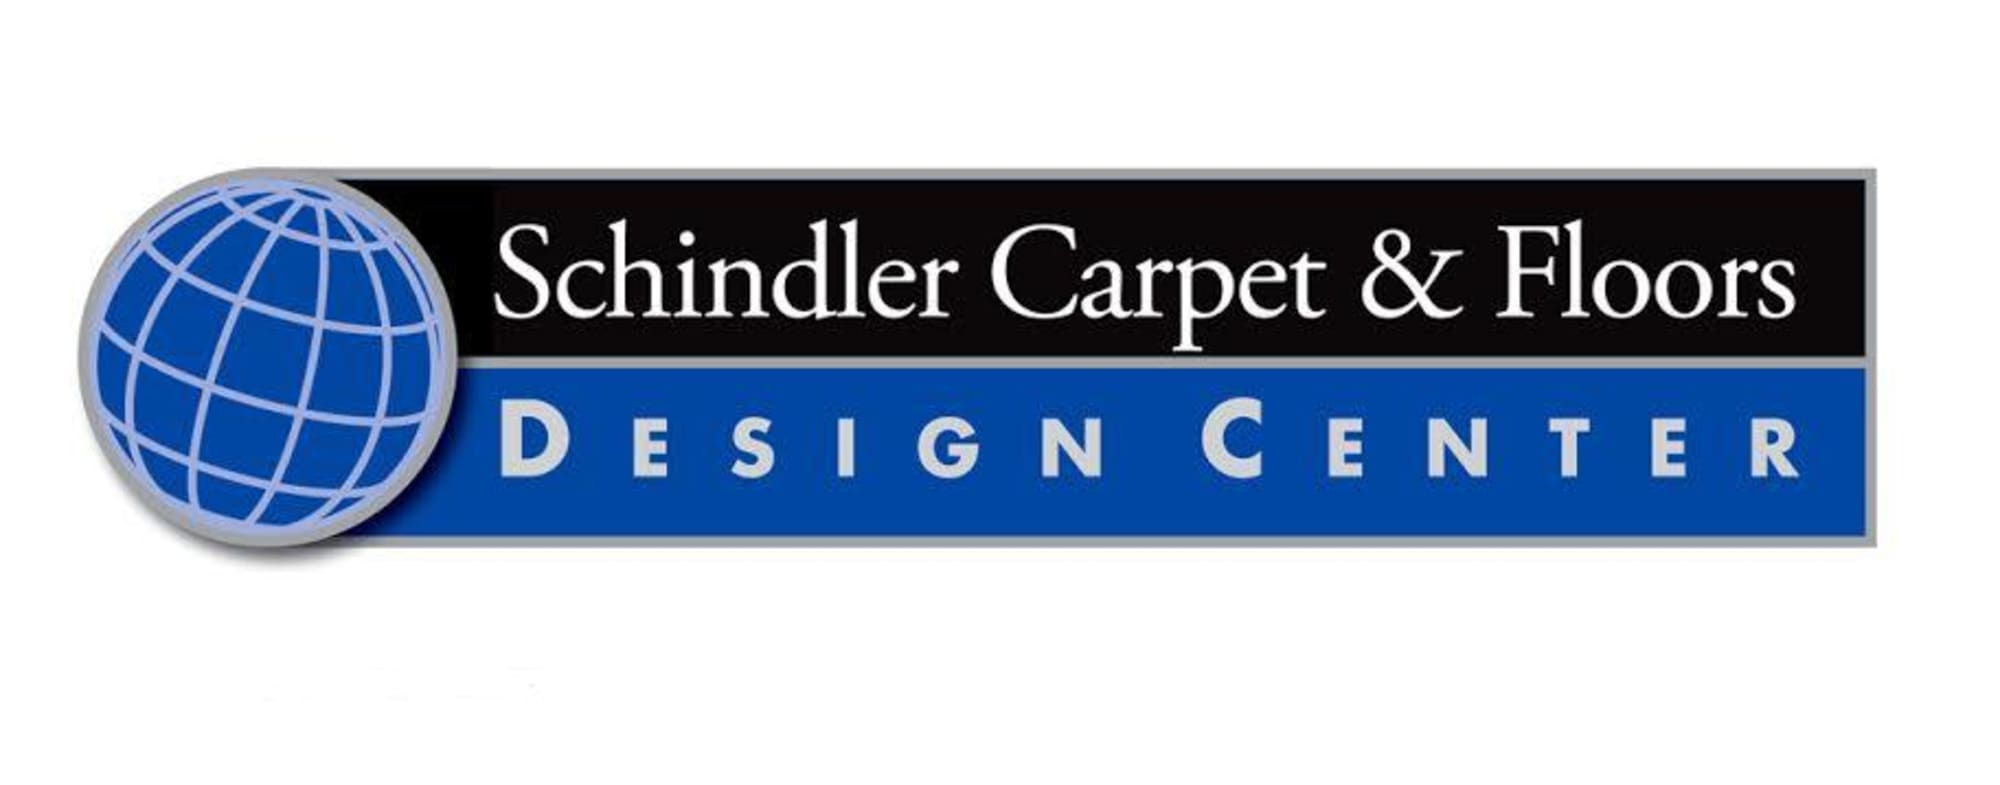 Schindler Carpet & Floors Design Center - 1430 S Main St Ste. A Lindale, TX 75771